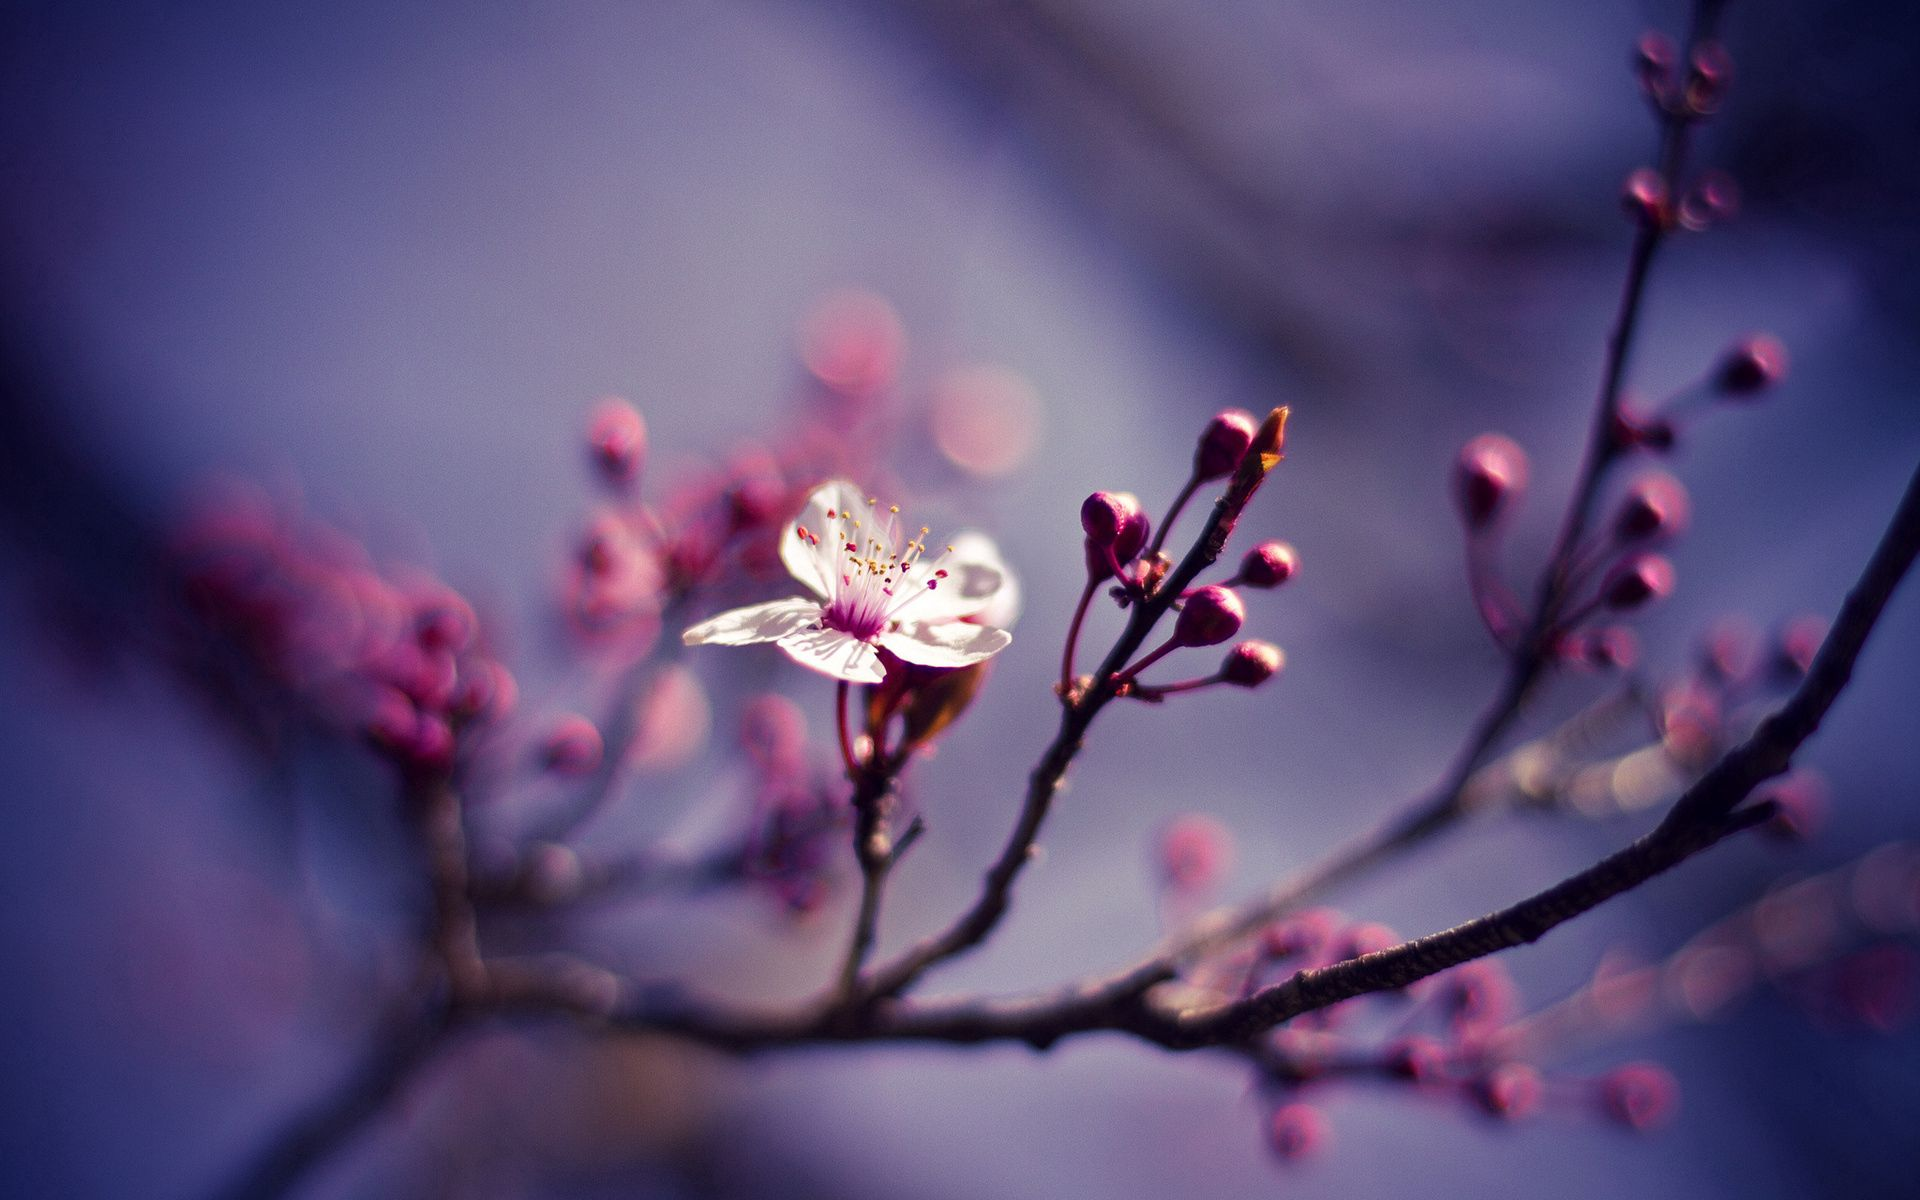 86616 Заставки и Обои Вишня на телефон. Скачать Природа, Вишня, Цветок, Макро, Ветви картинки бесплатно